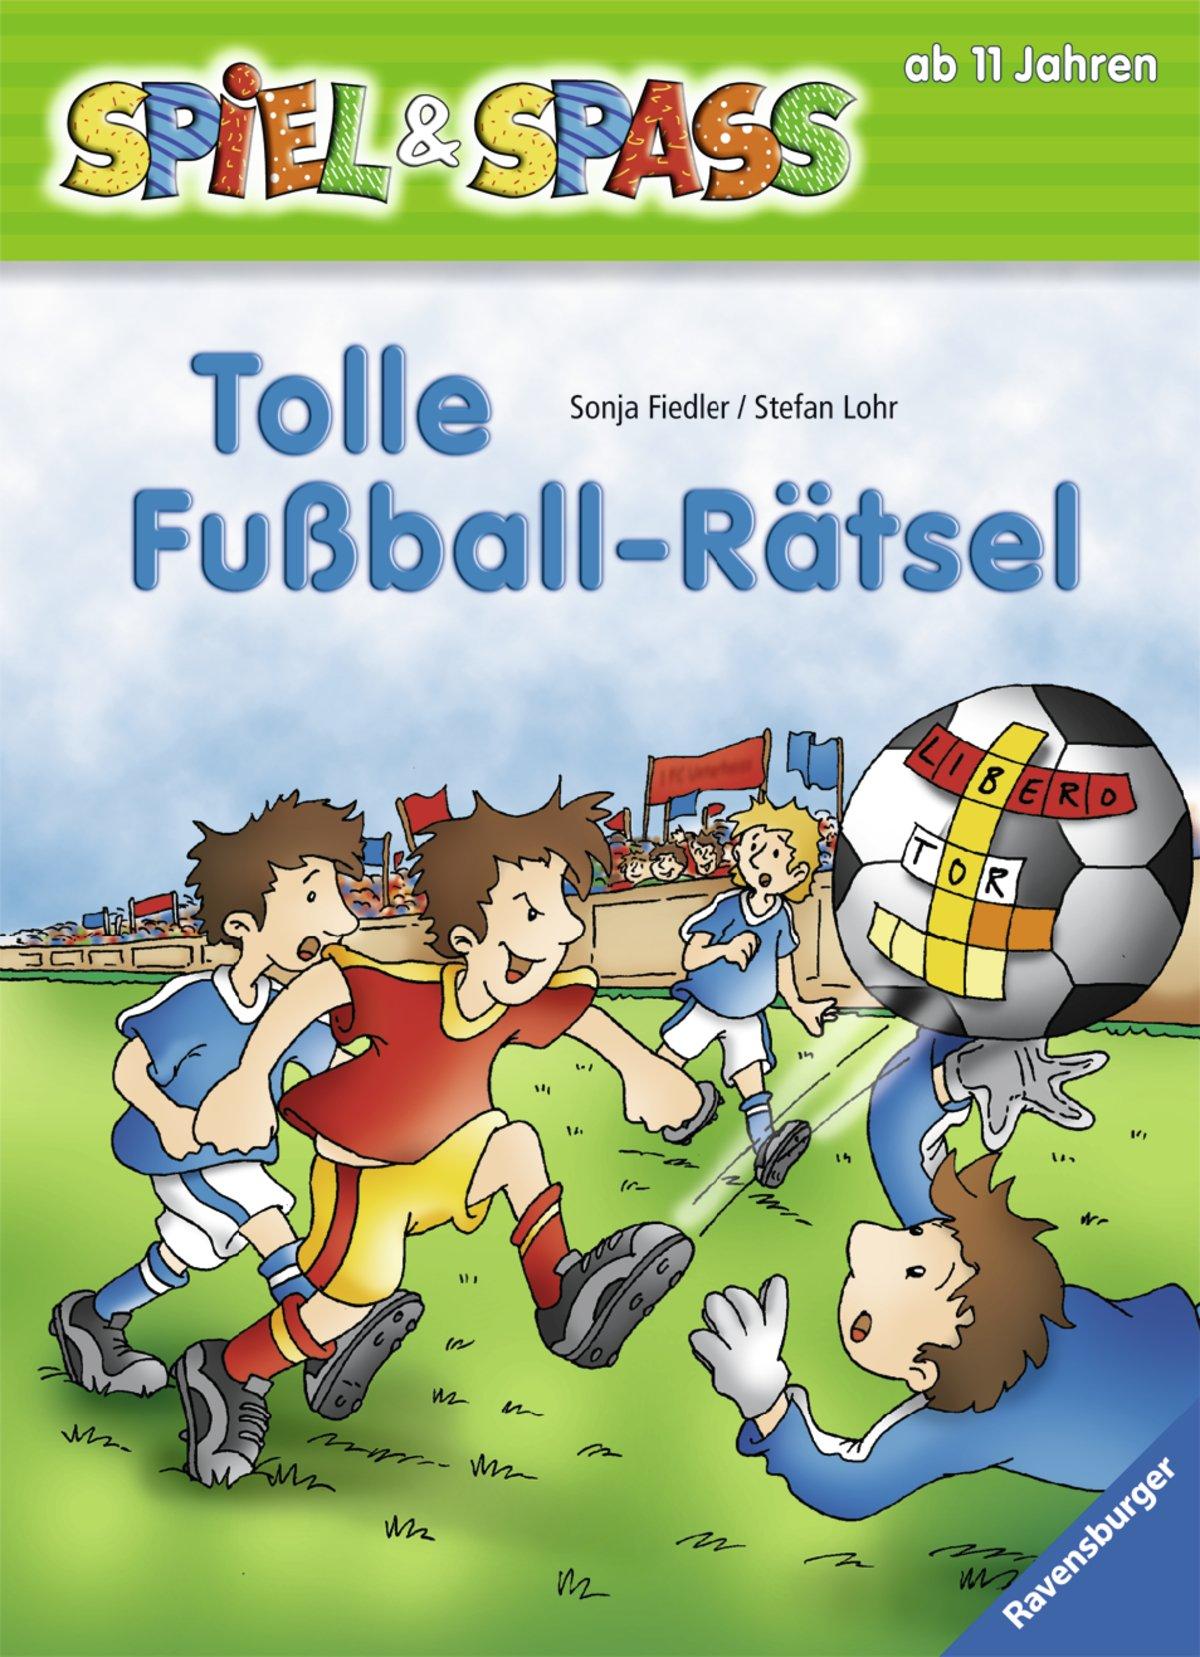 Tolle Fußball-Rätsel (Spiel & Spaß)